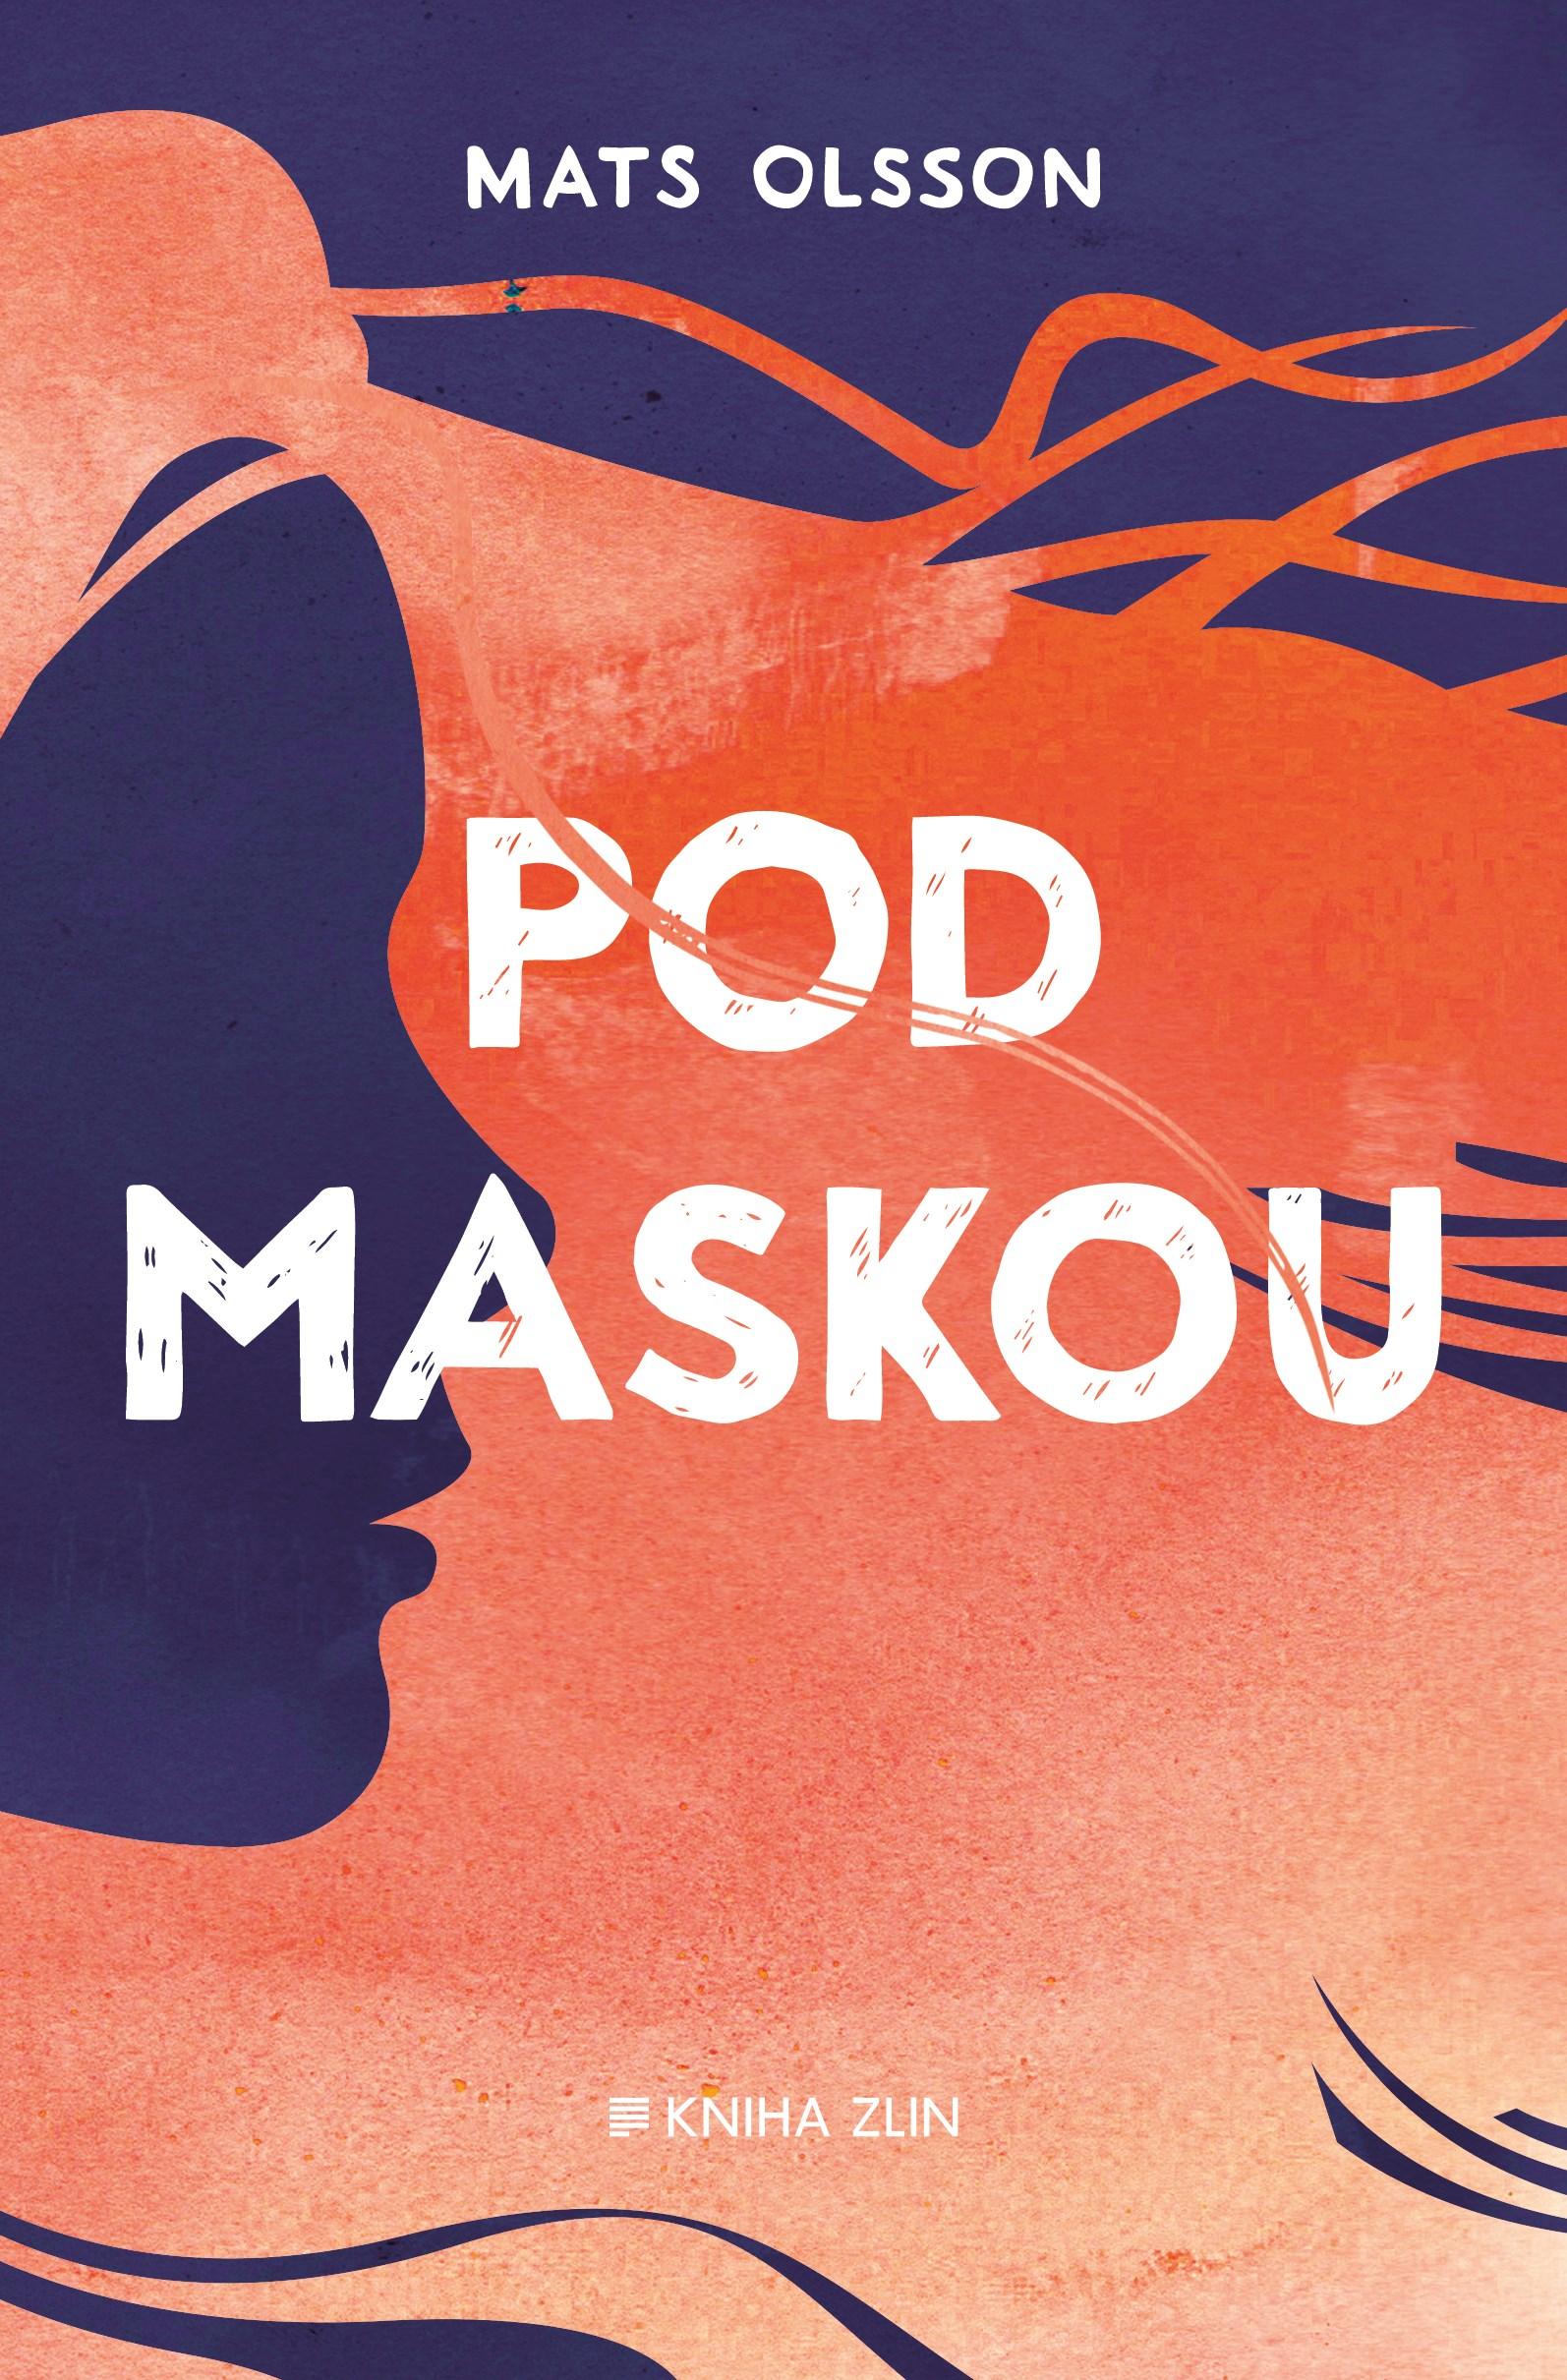 Pod maskou | Mats Olsson